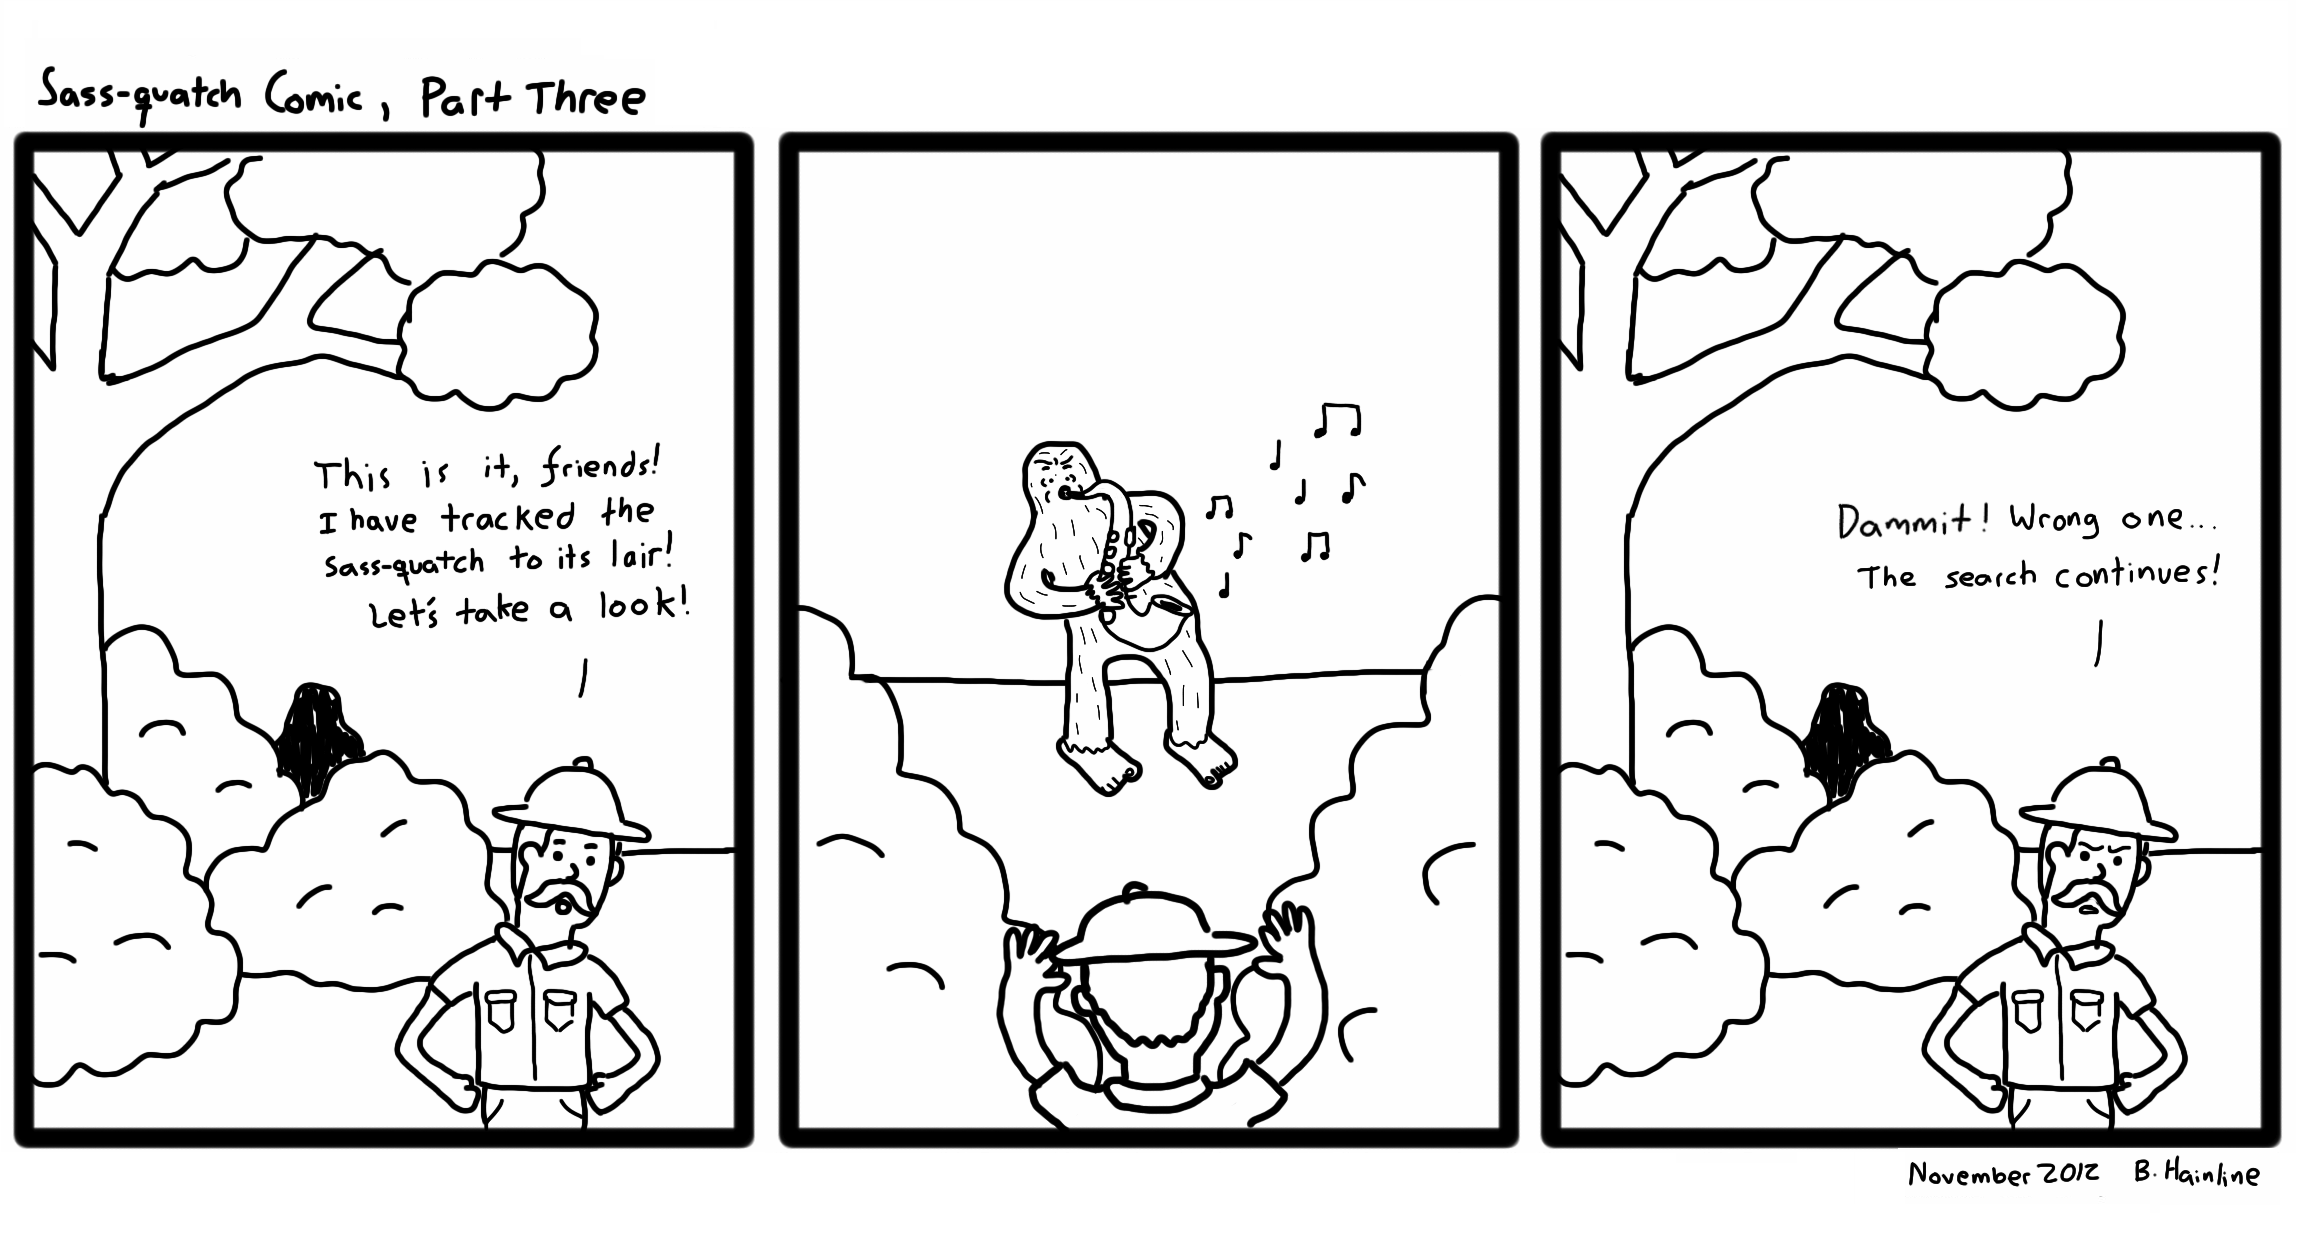 Sass-quatch Comic, Part Three